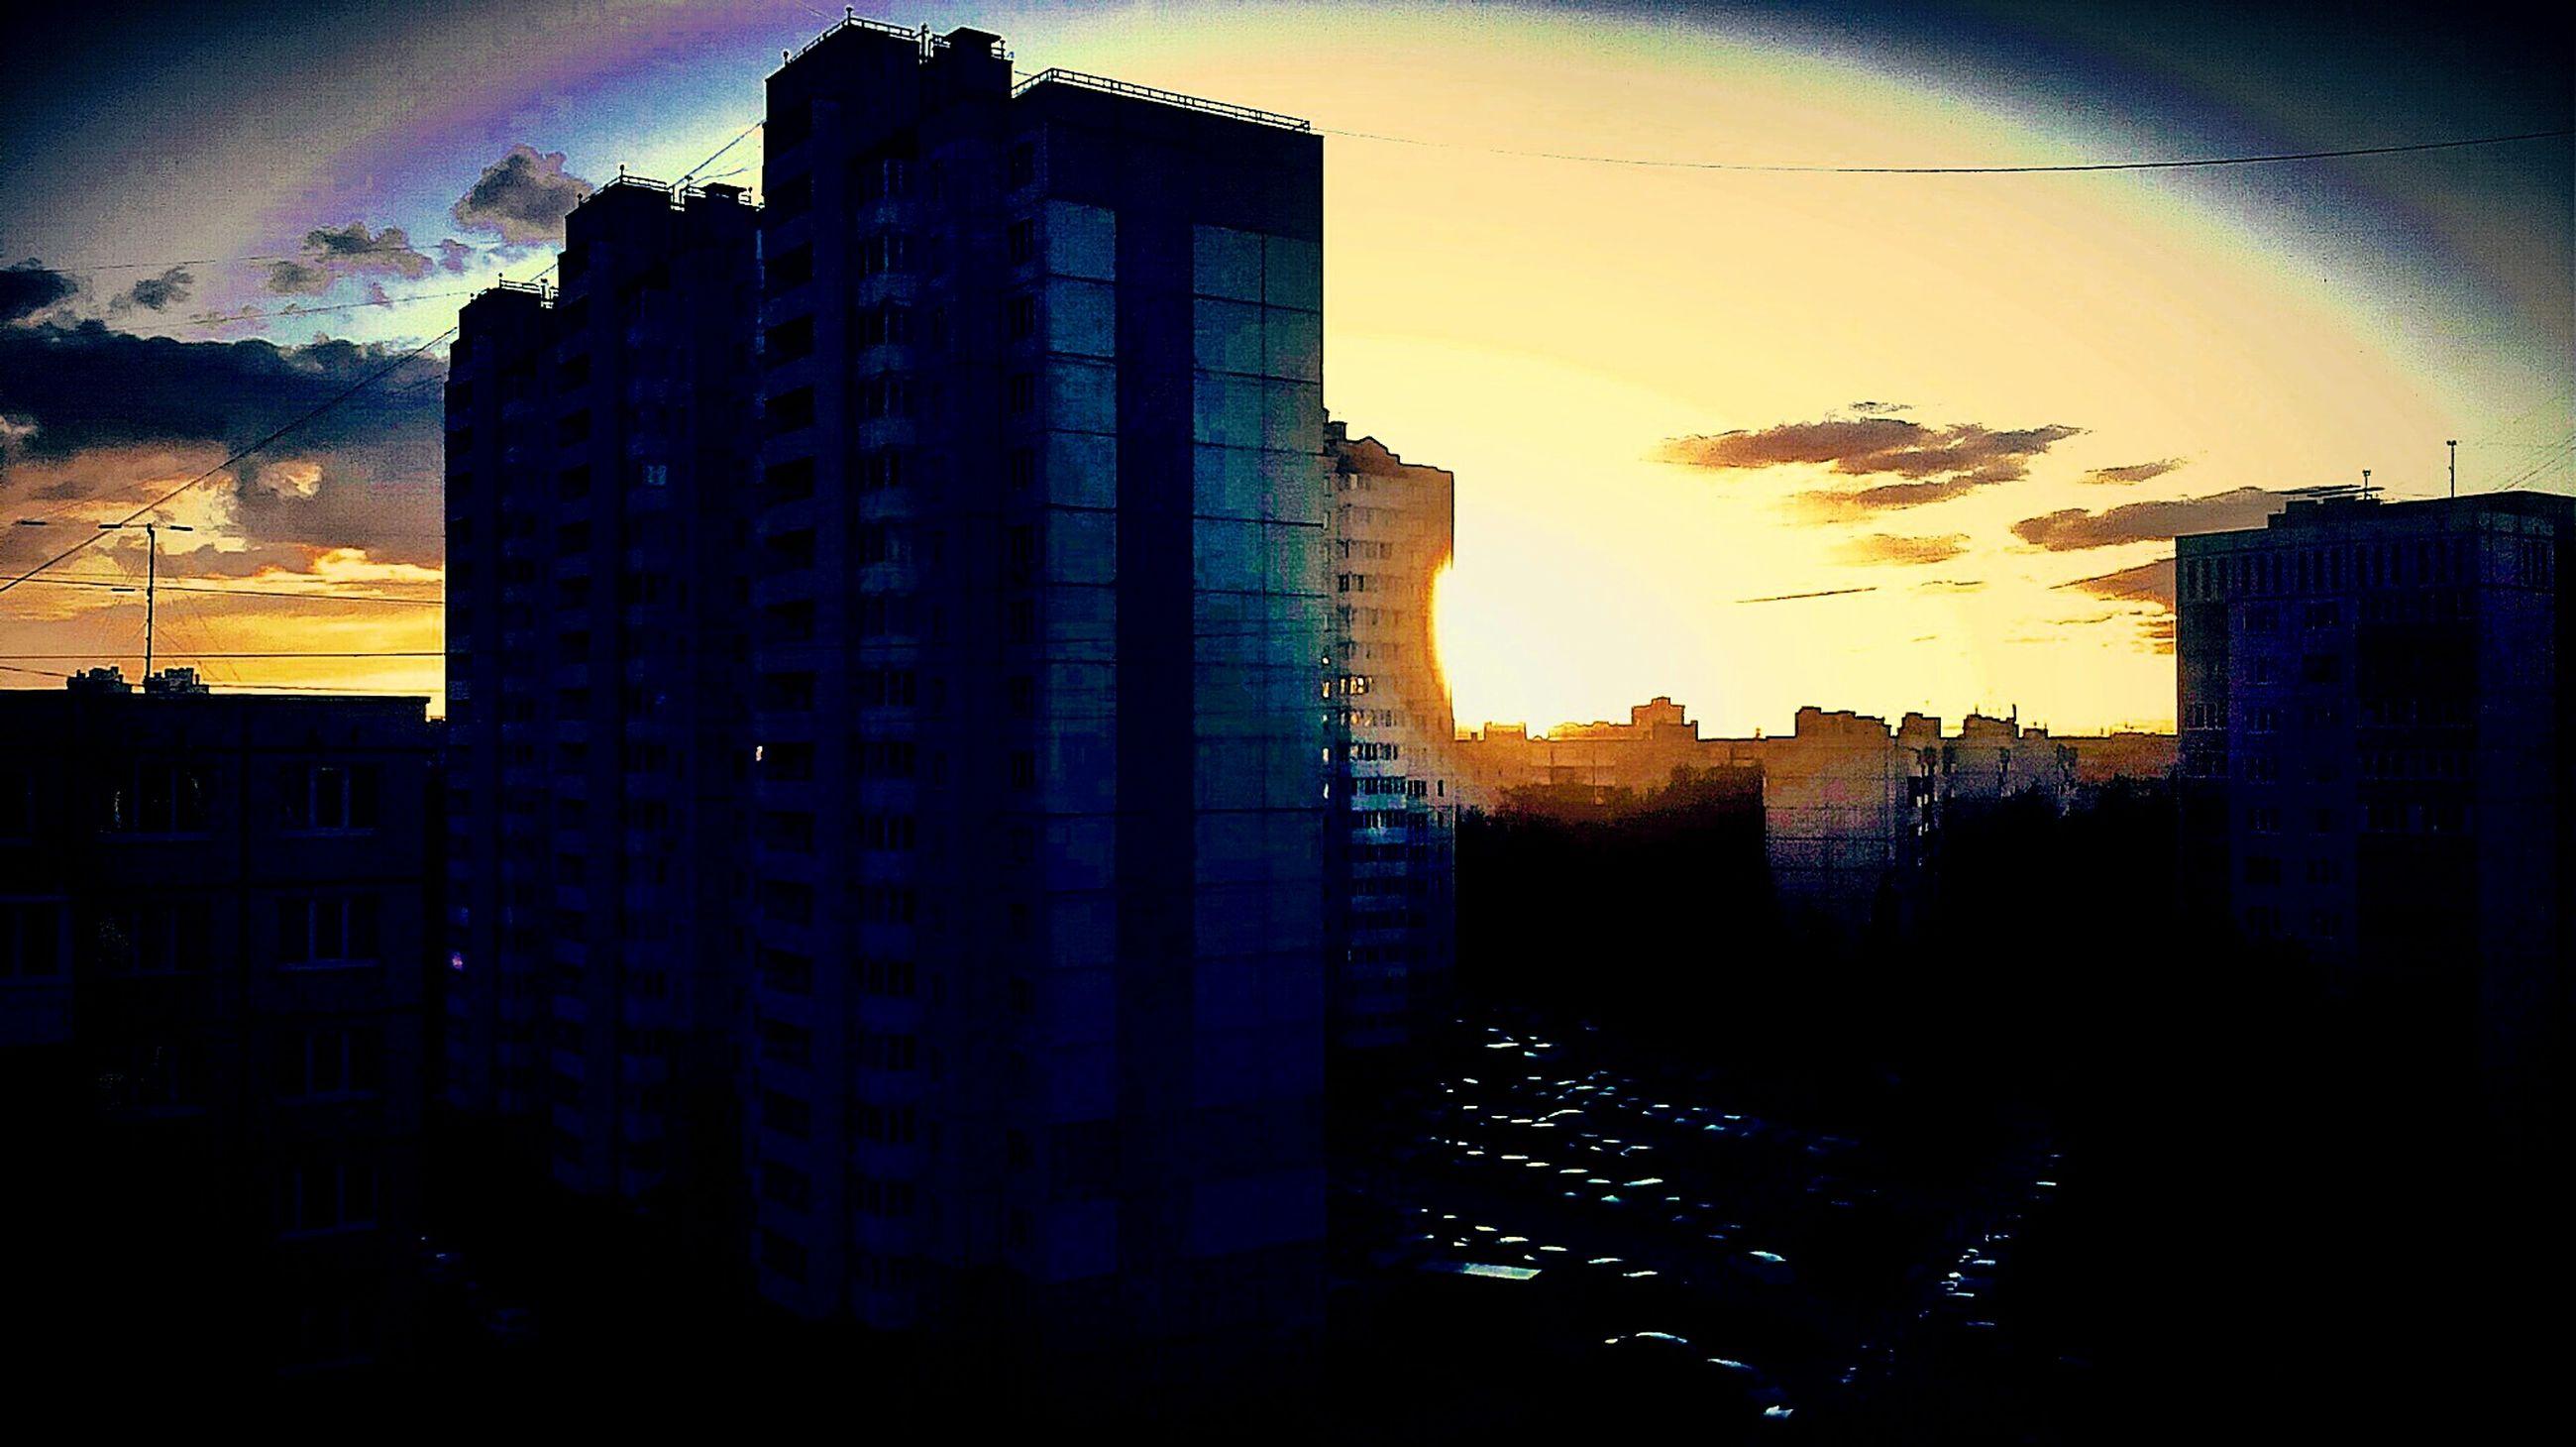 building exterior, sunset, architecture, built structure, city, sky, silhouette, cityscape, orange color, cloud - sky, building, residential building, residential structure, sun, sunlight, skyscraper, residential district, dusk, no people, outdoors